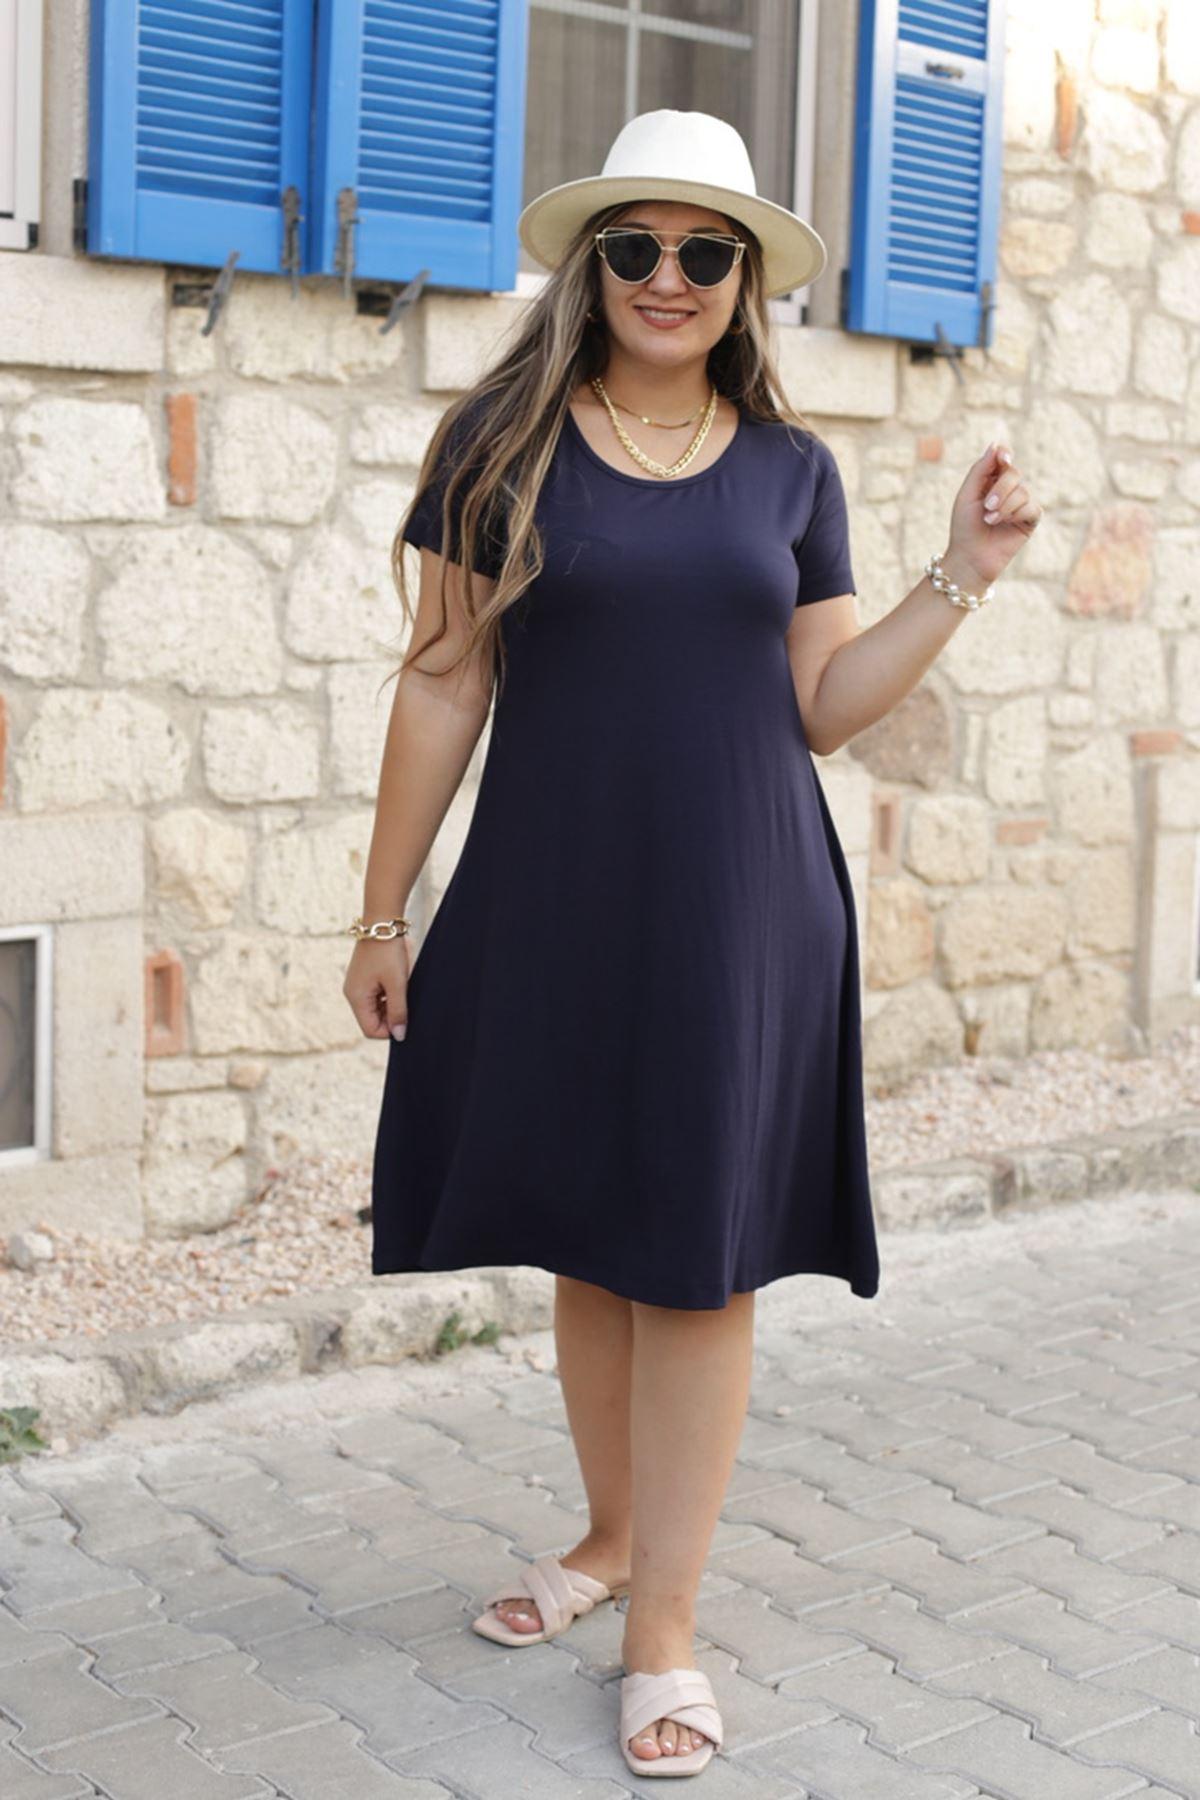 RENKTE KISA KOLLU ESNEK LACİVERT ELBİSE